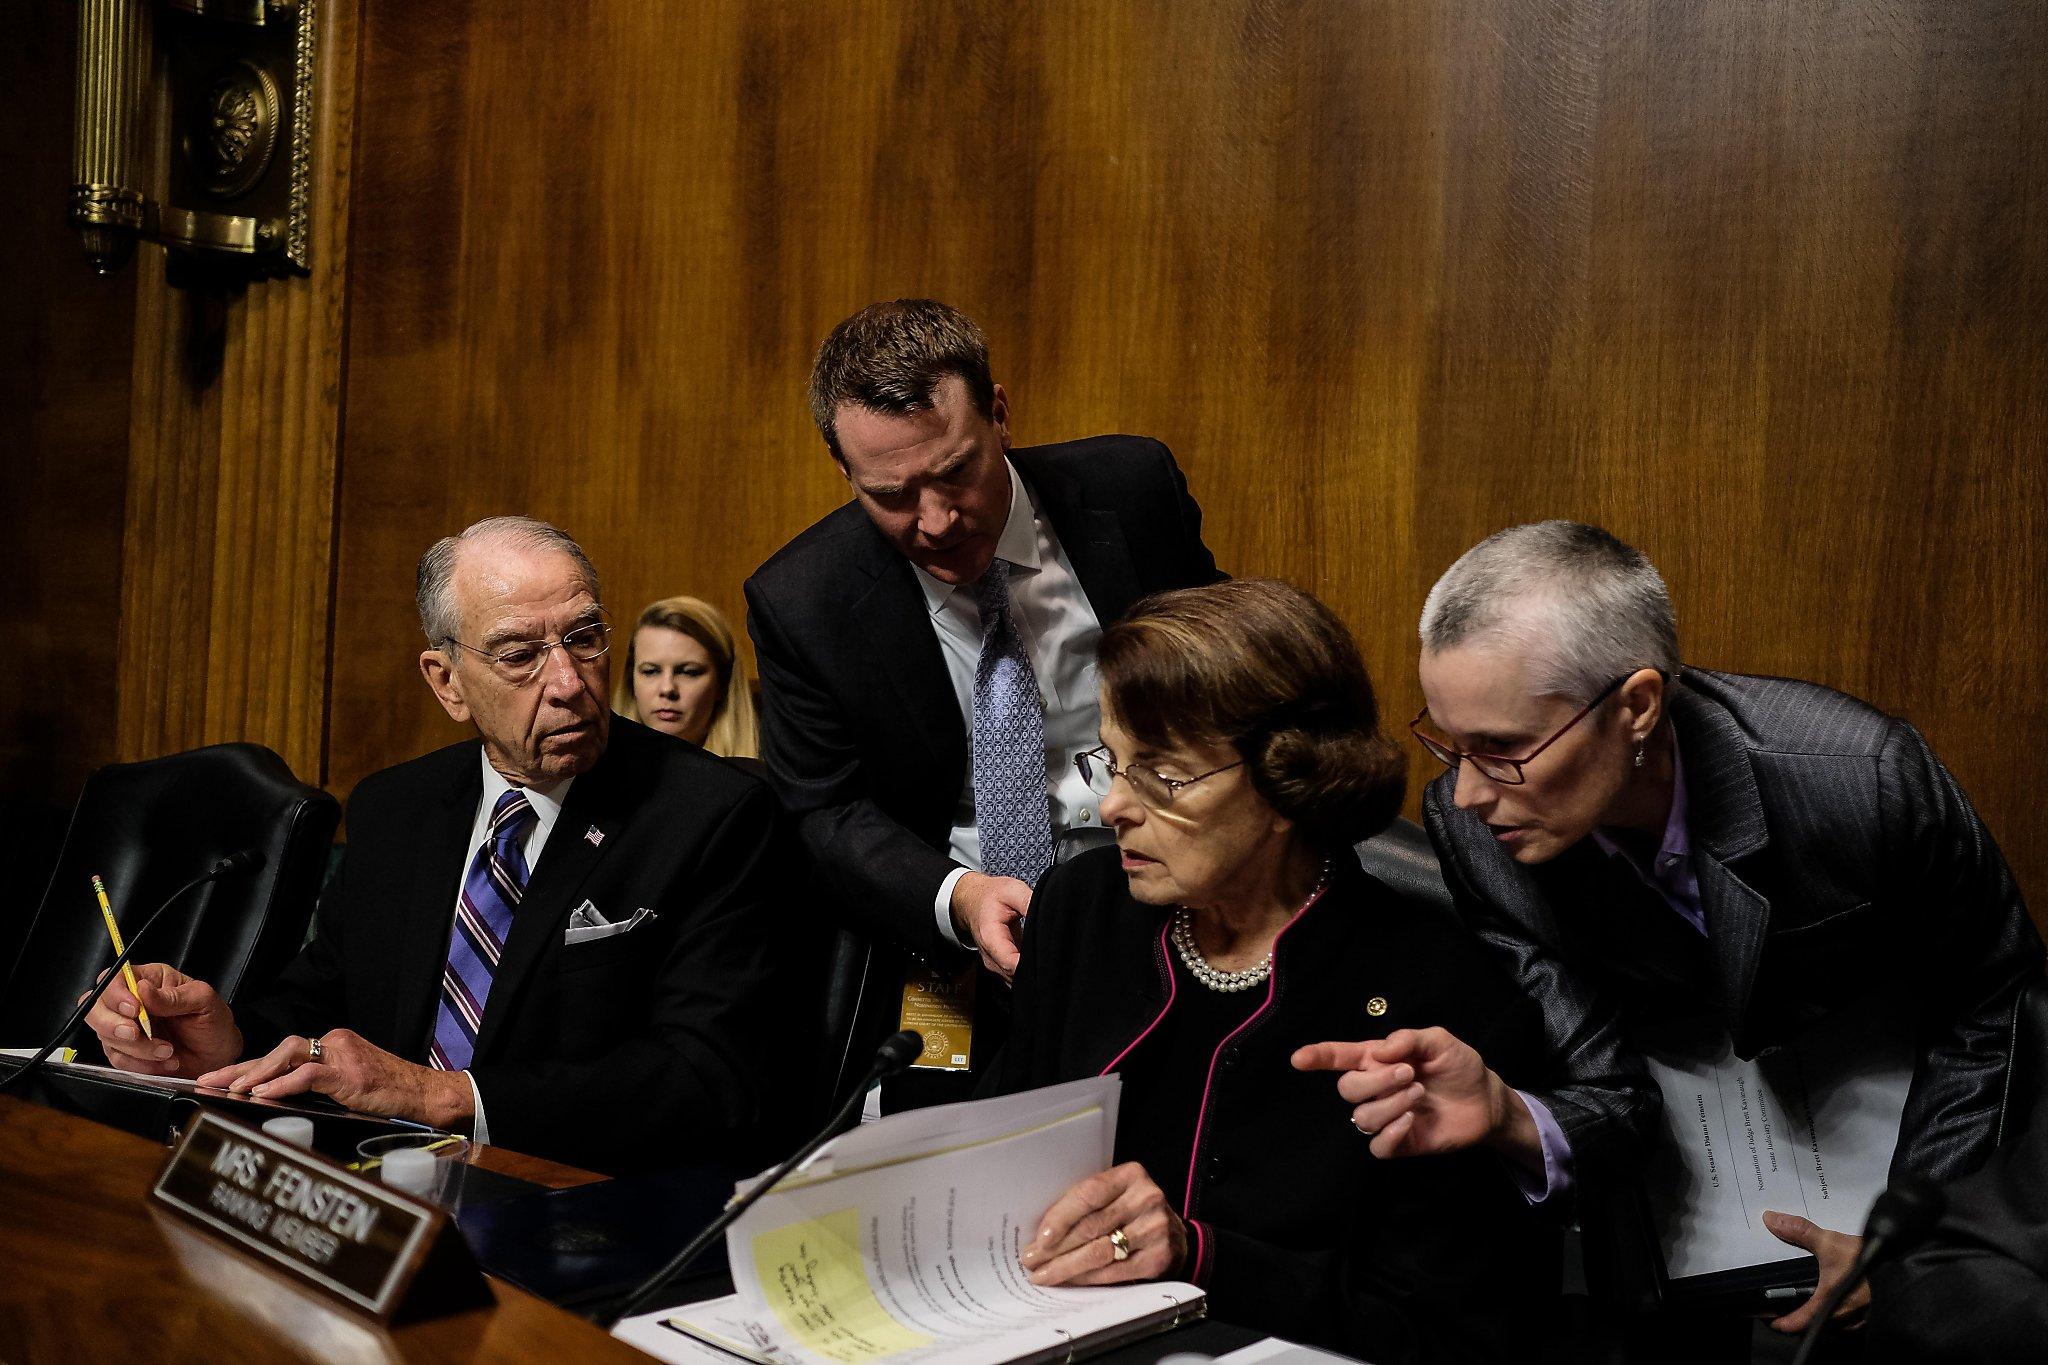 Progressives target Dianne Feinstein as head of Senate Judiciary Committee